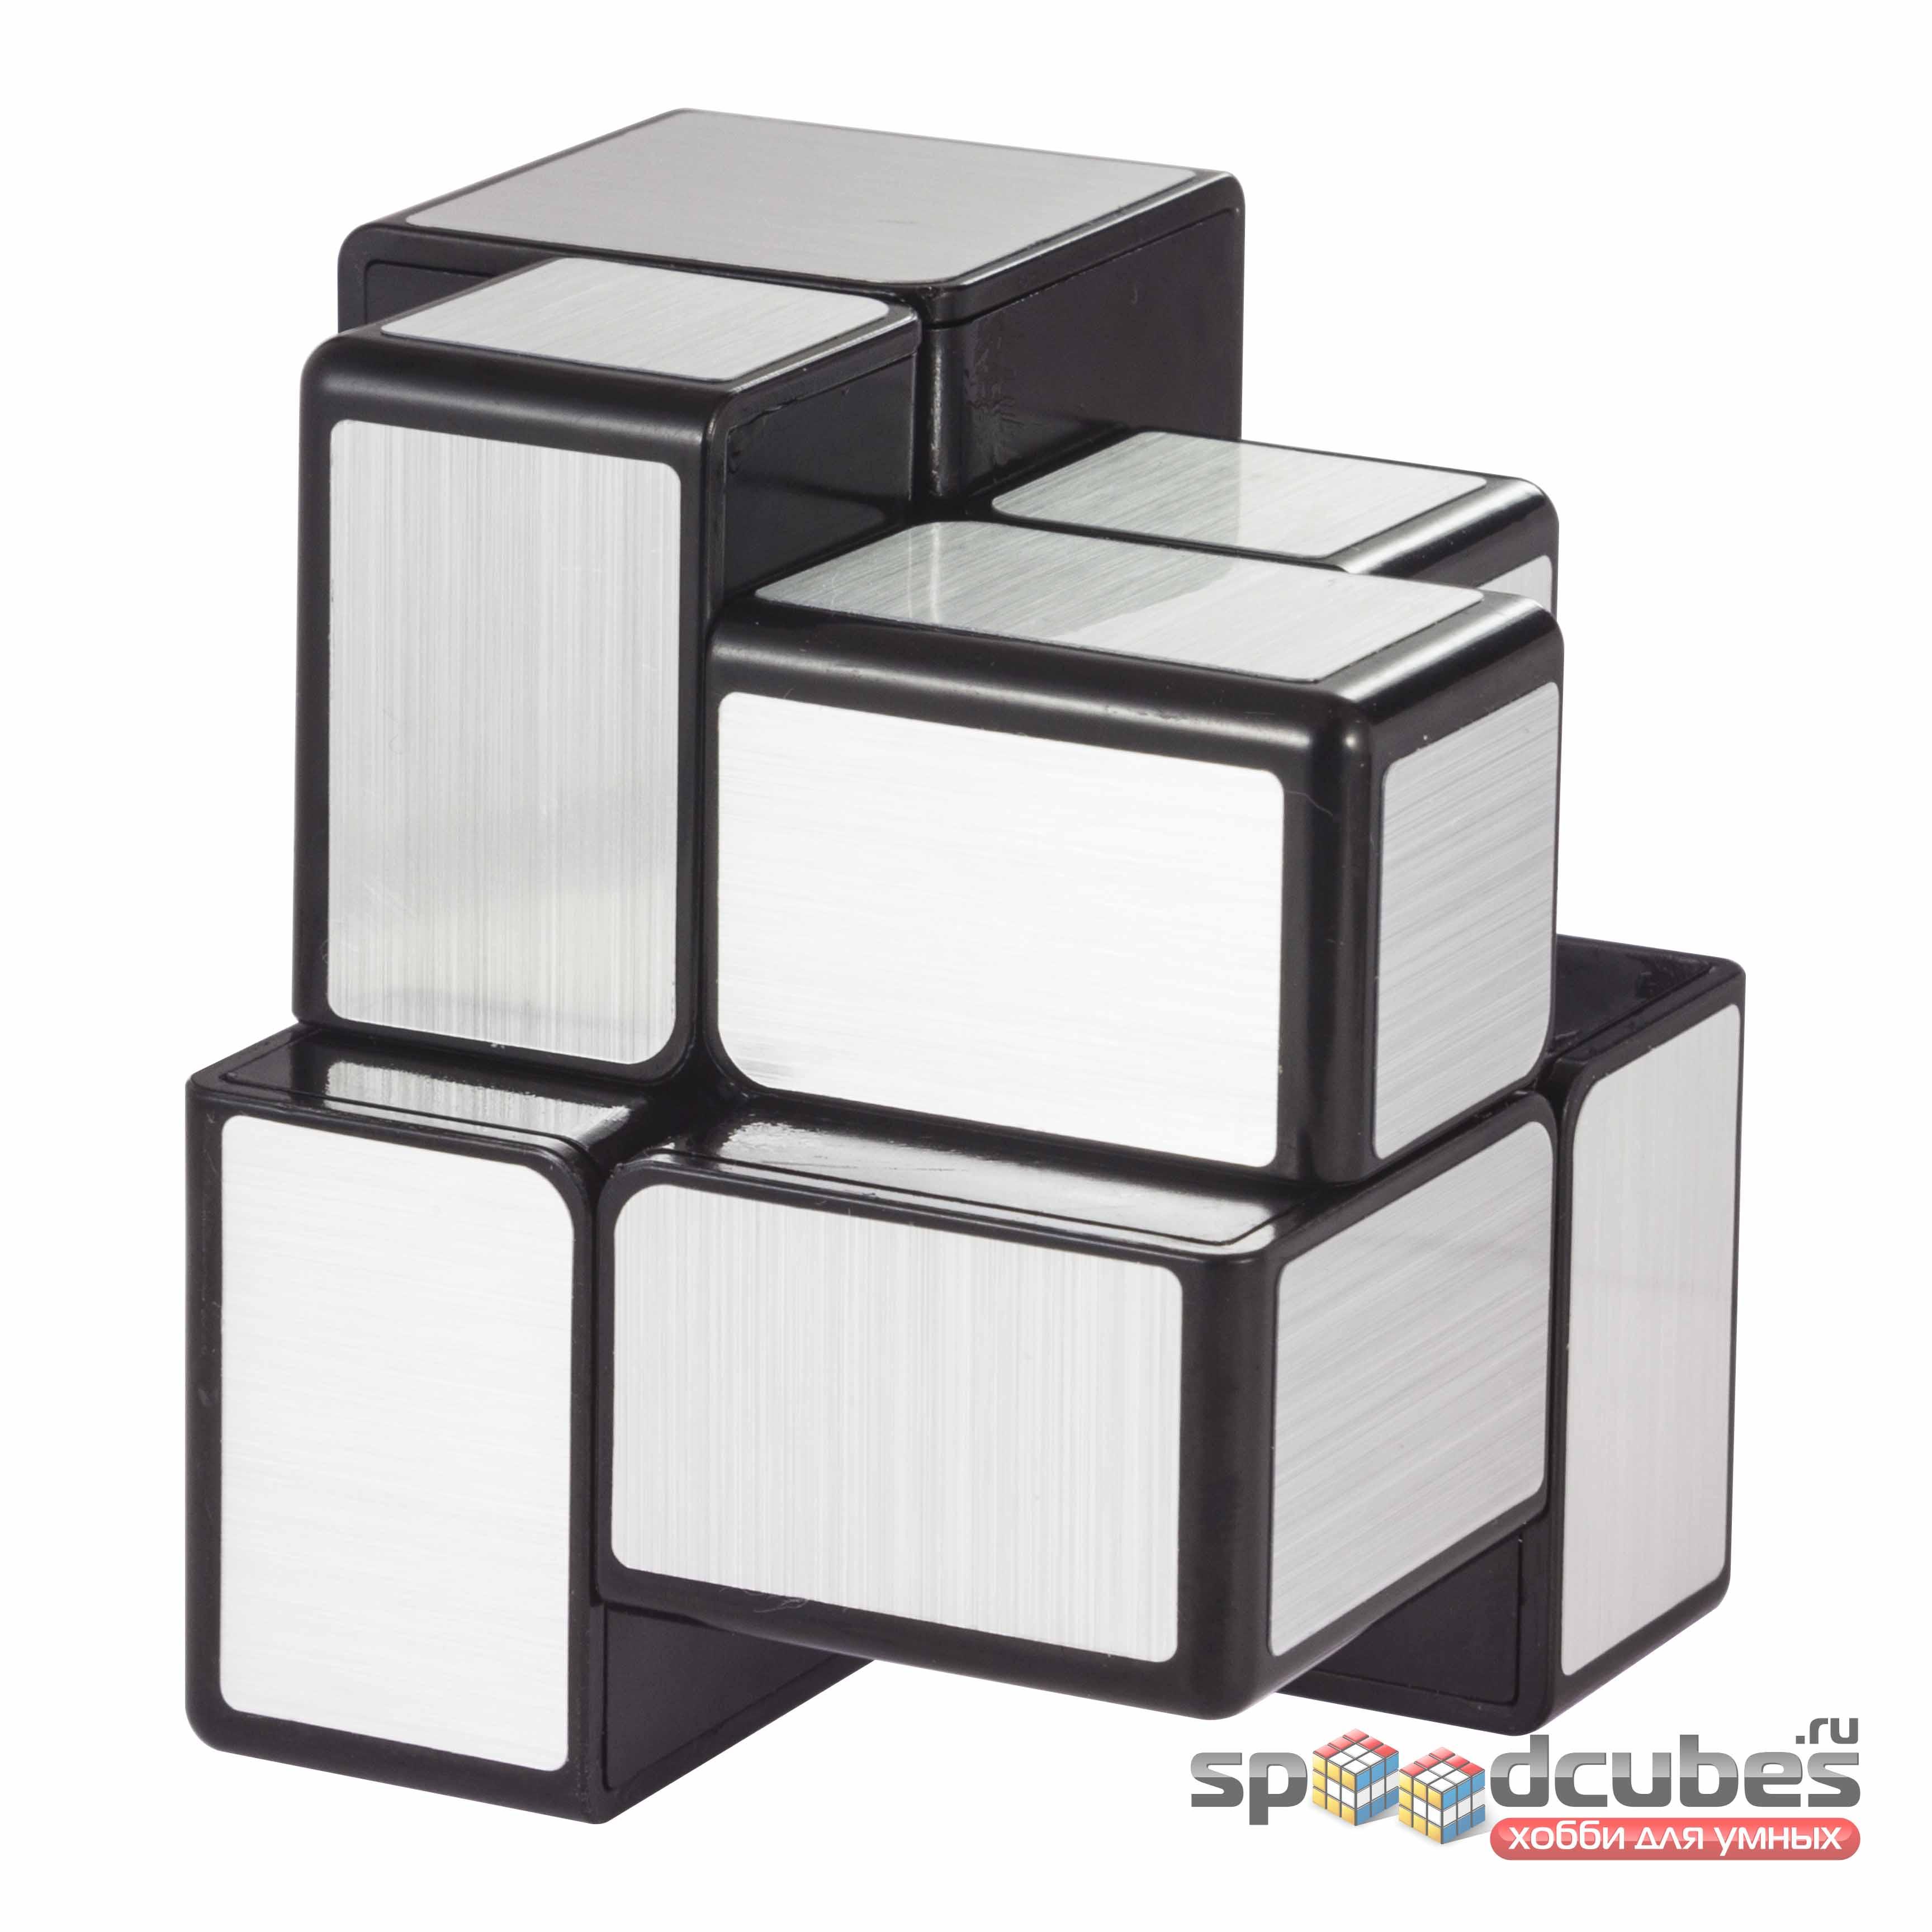 QiYi (MoFangGe) 2x2 Mirror Cube 3